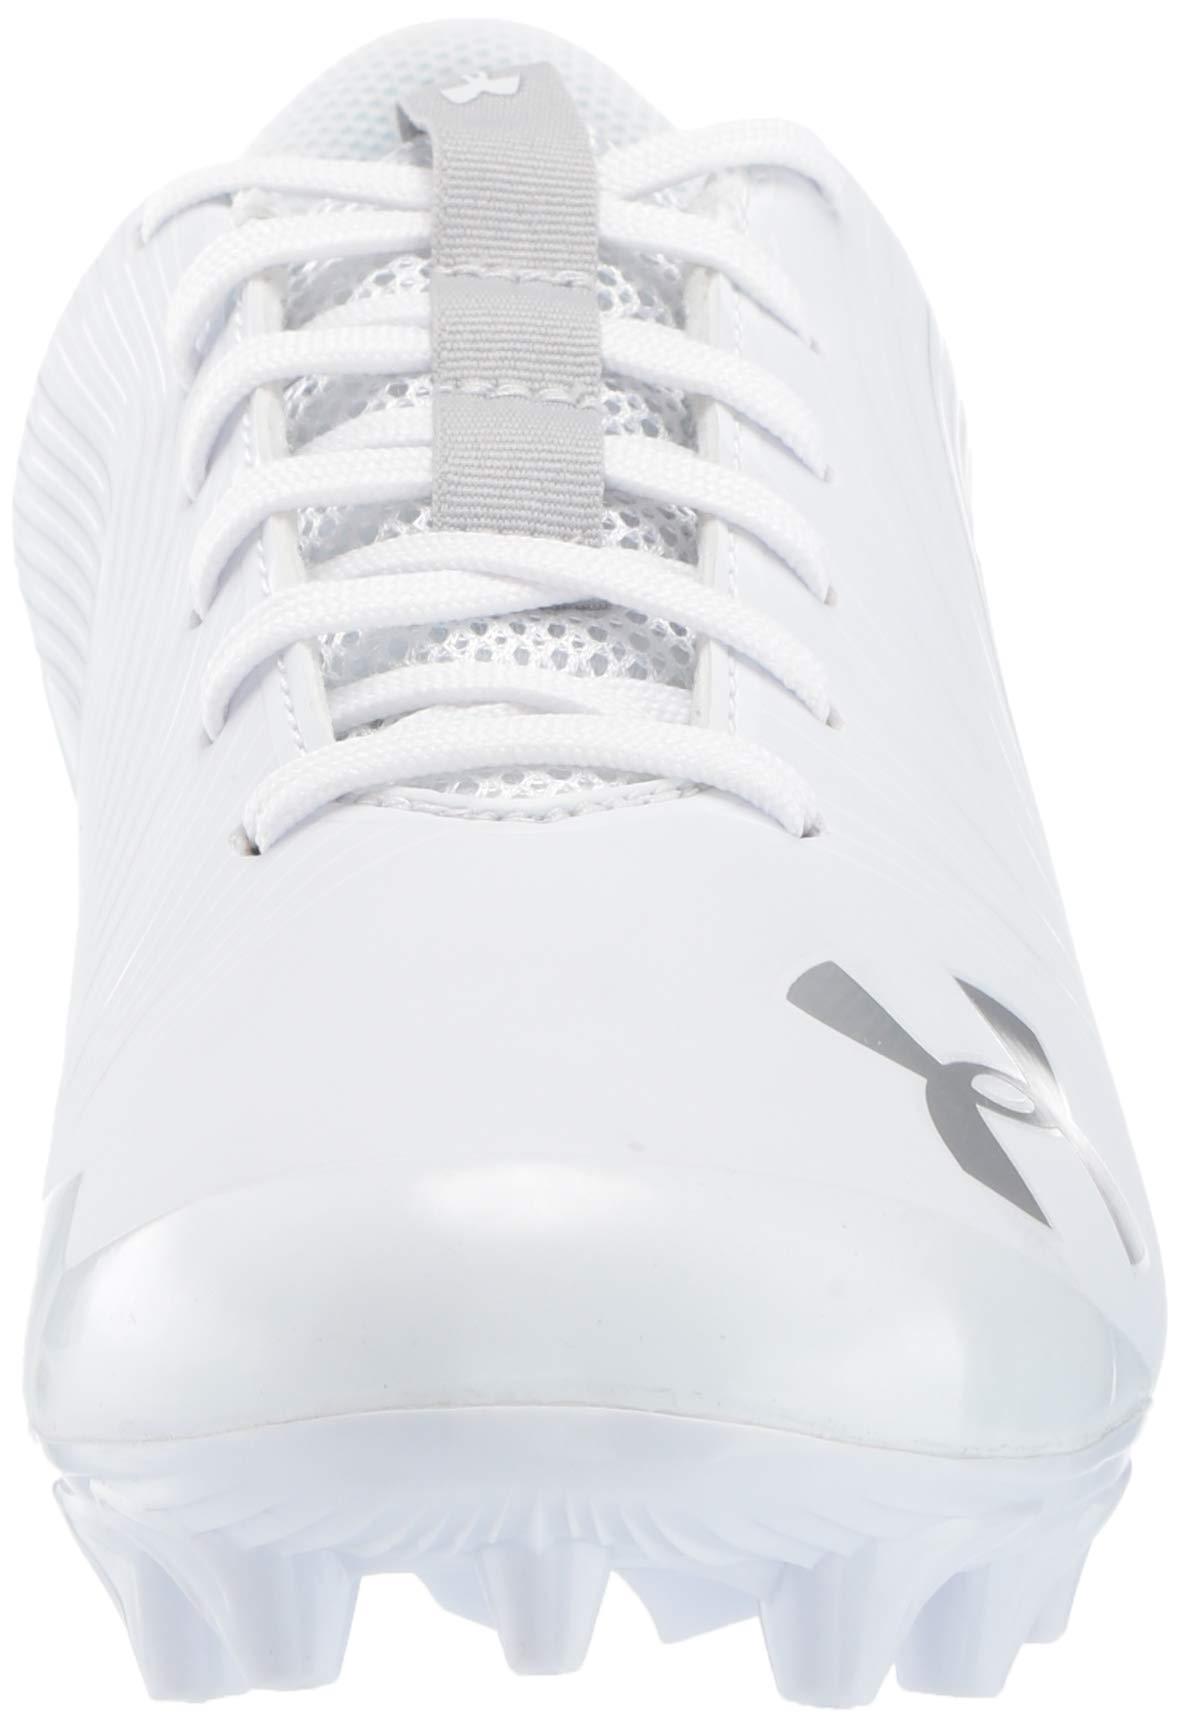 Under Armour Men's Speed Phantom MC Football Shoe, White/White, 7.5 M US by Under Armour (Image #4)